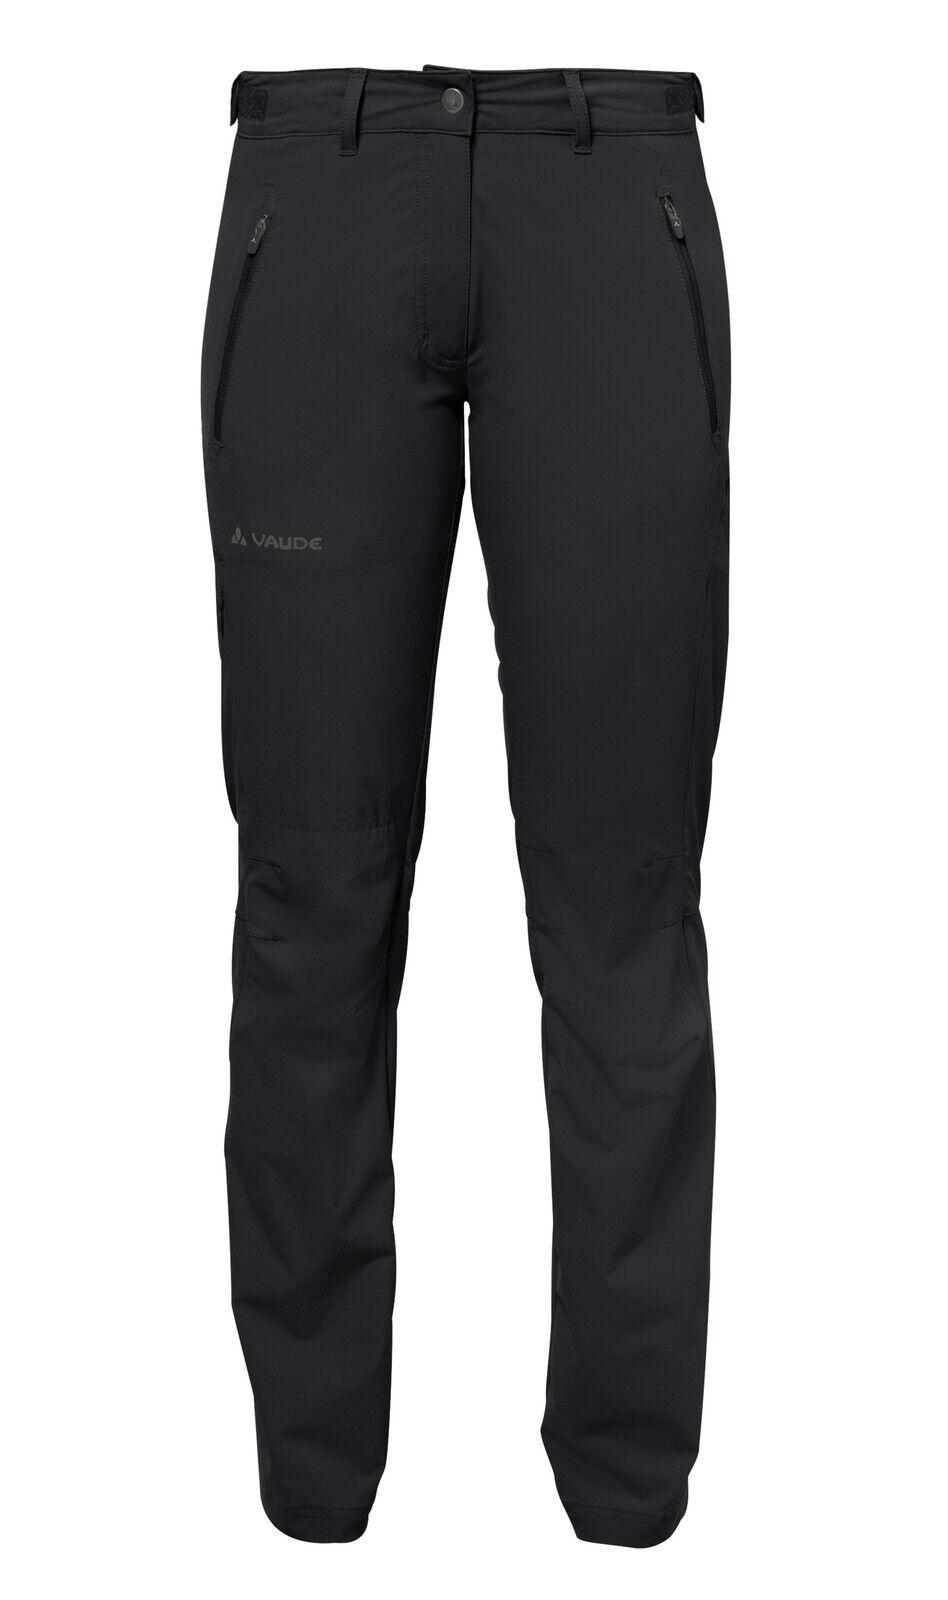 Vaude Wouomo Farley Stretch Pants Ii 04576  Wanderhose da donna